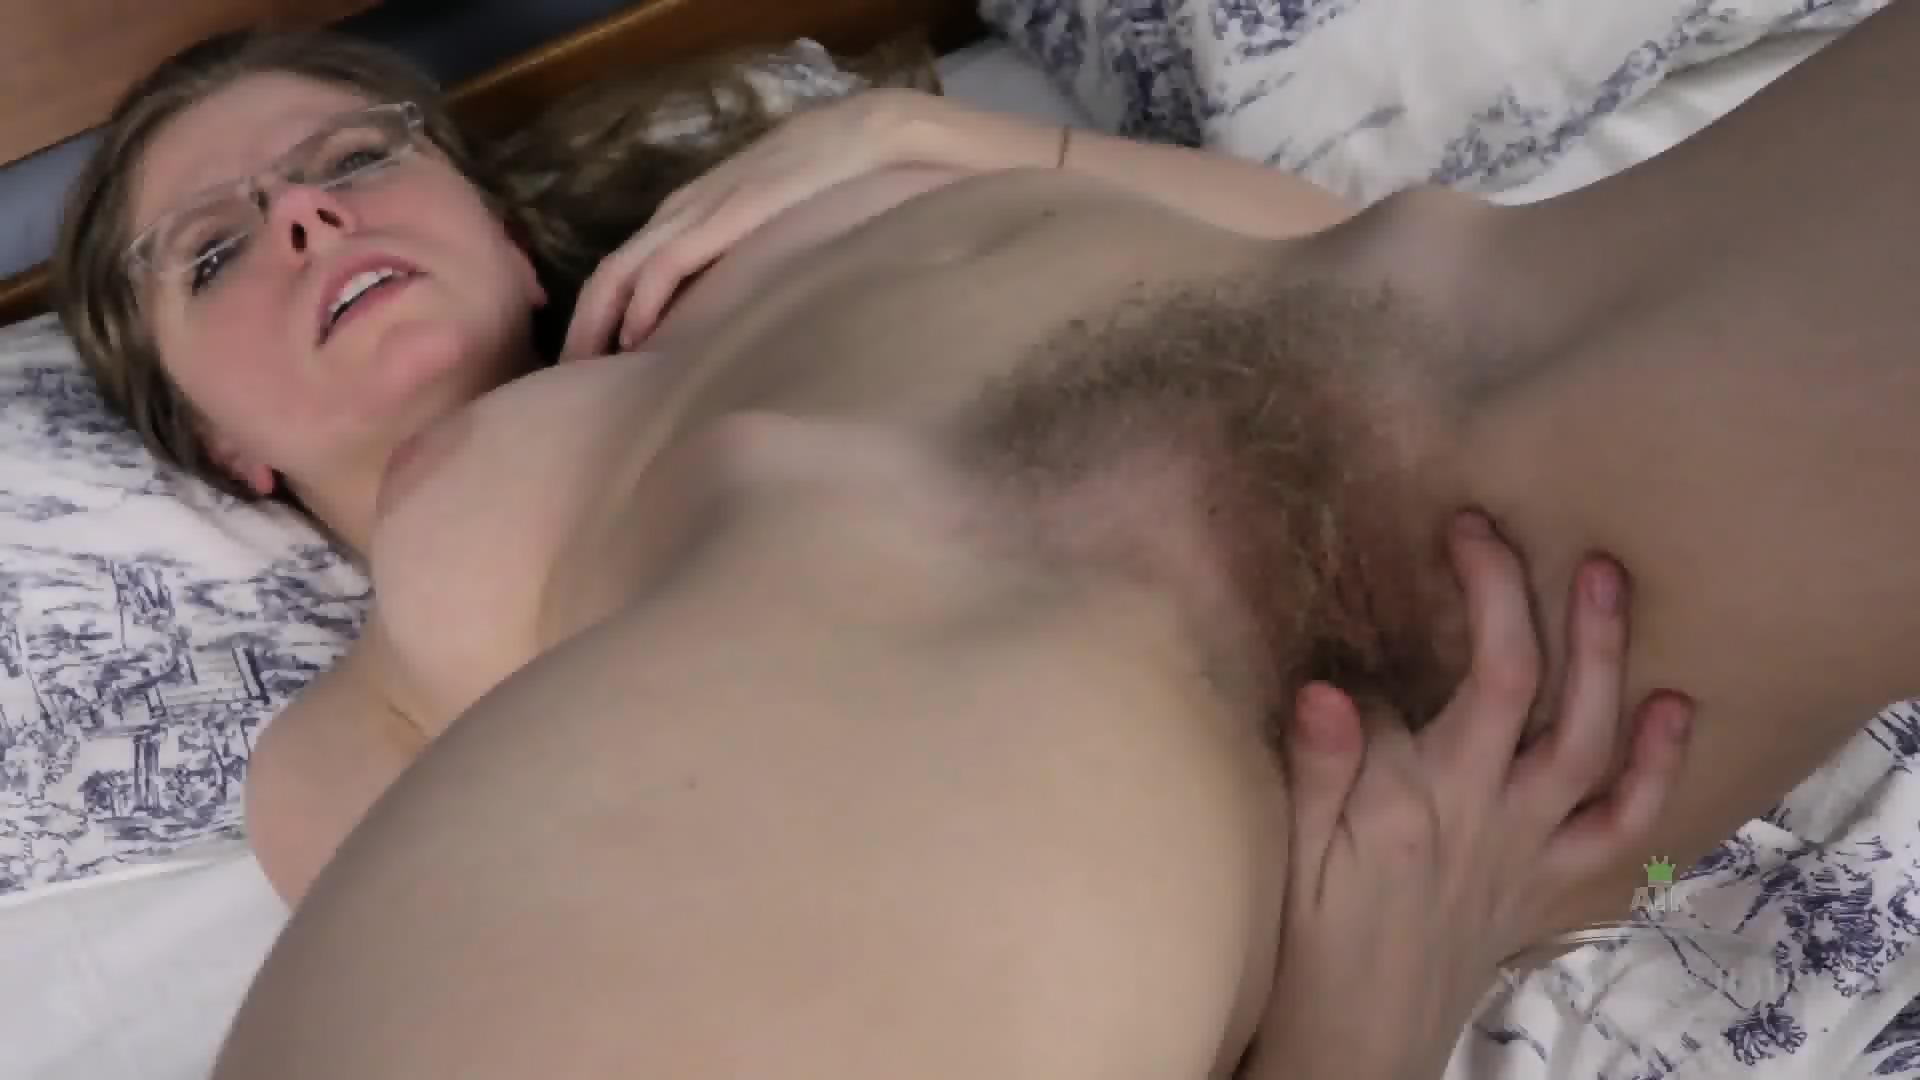 Midget pussy pictures